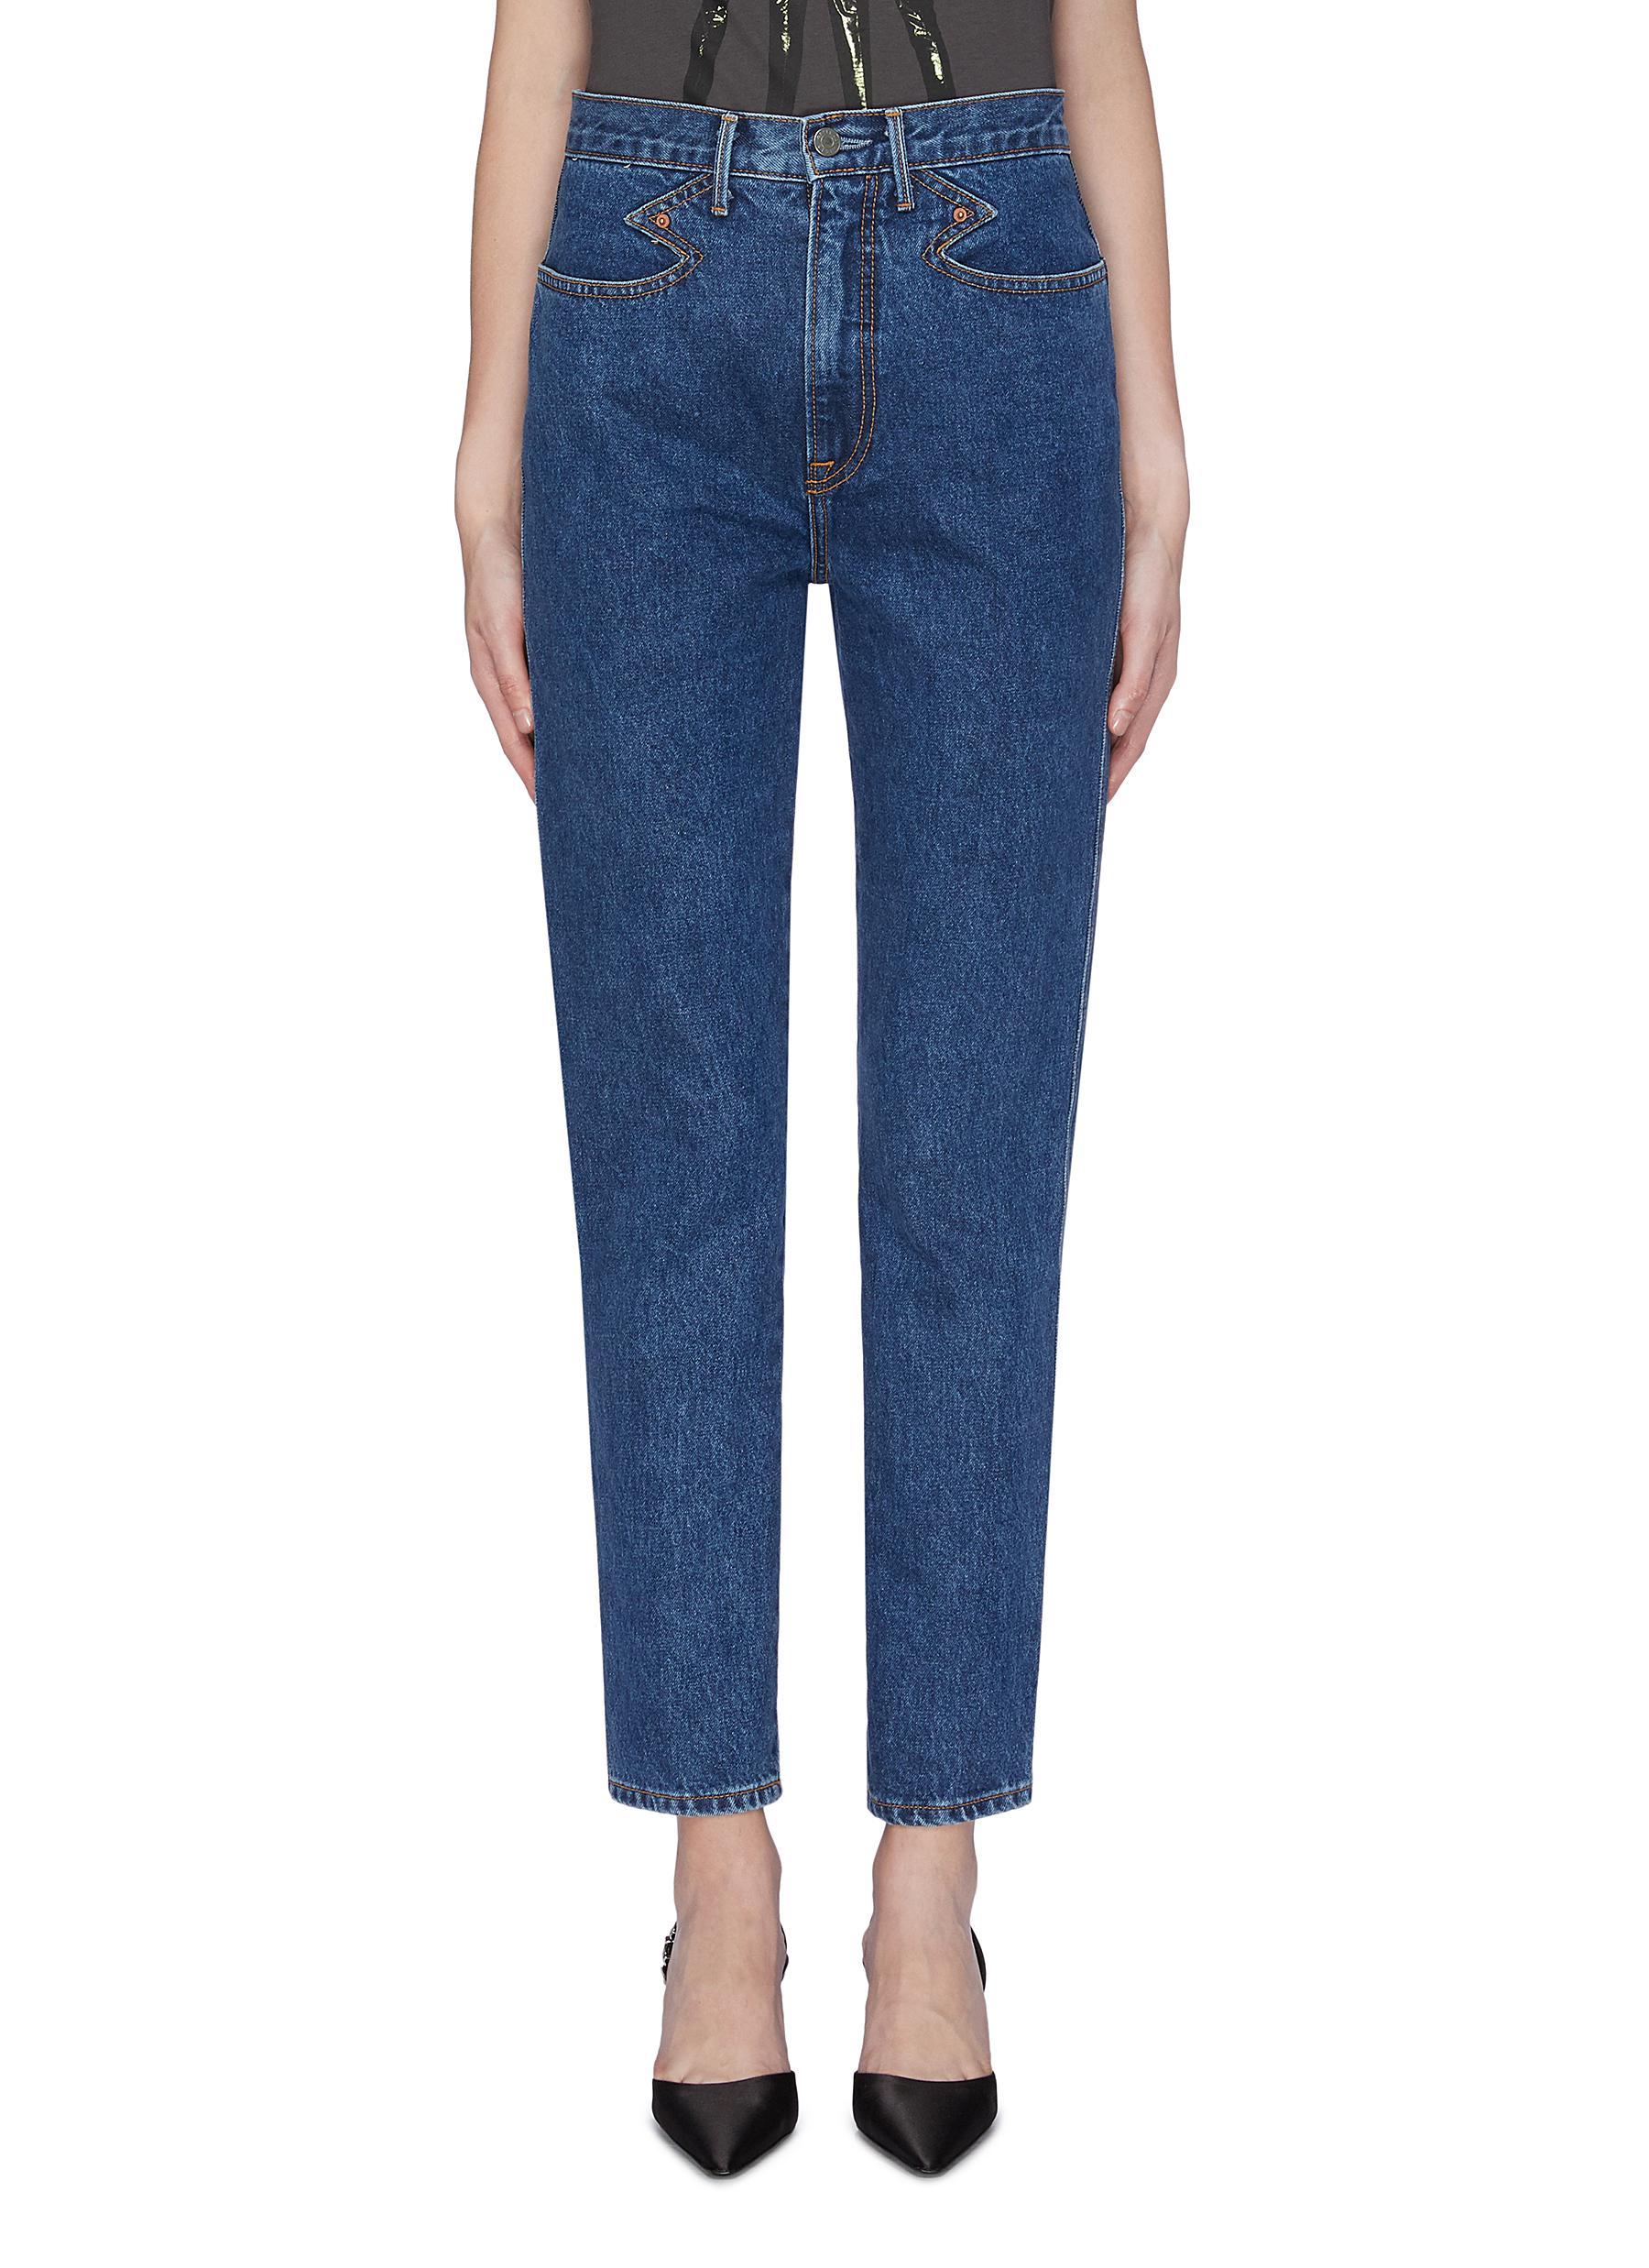 Rossana straight leg jeans by Grlfrnd